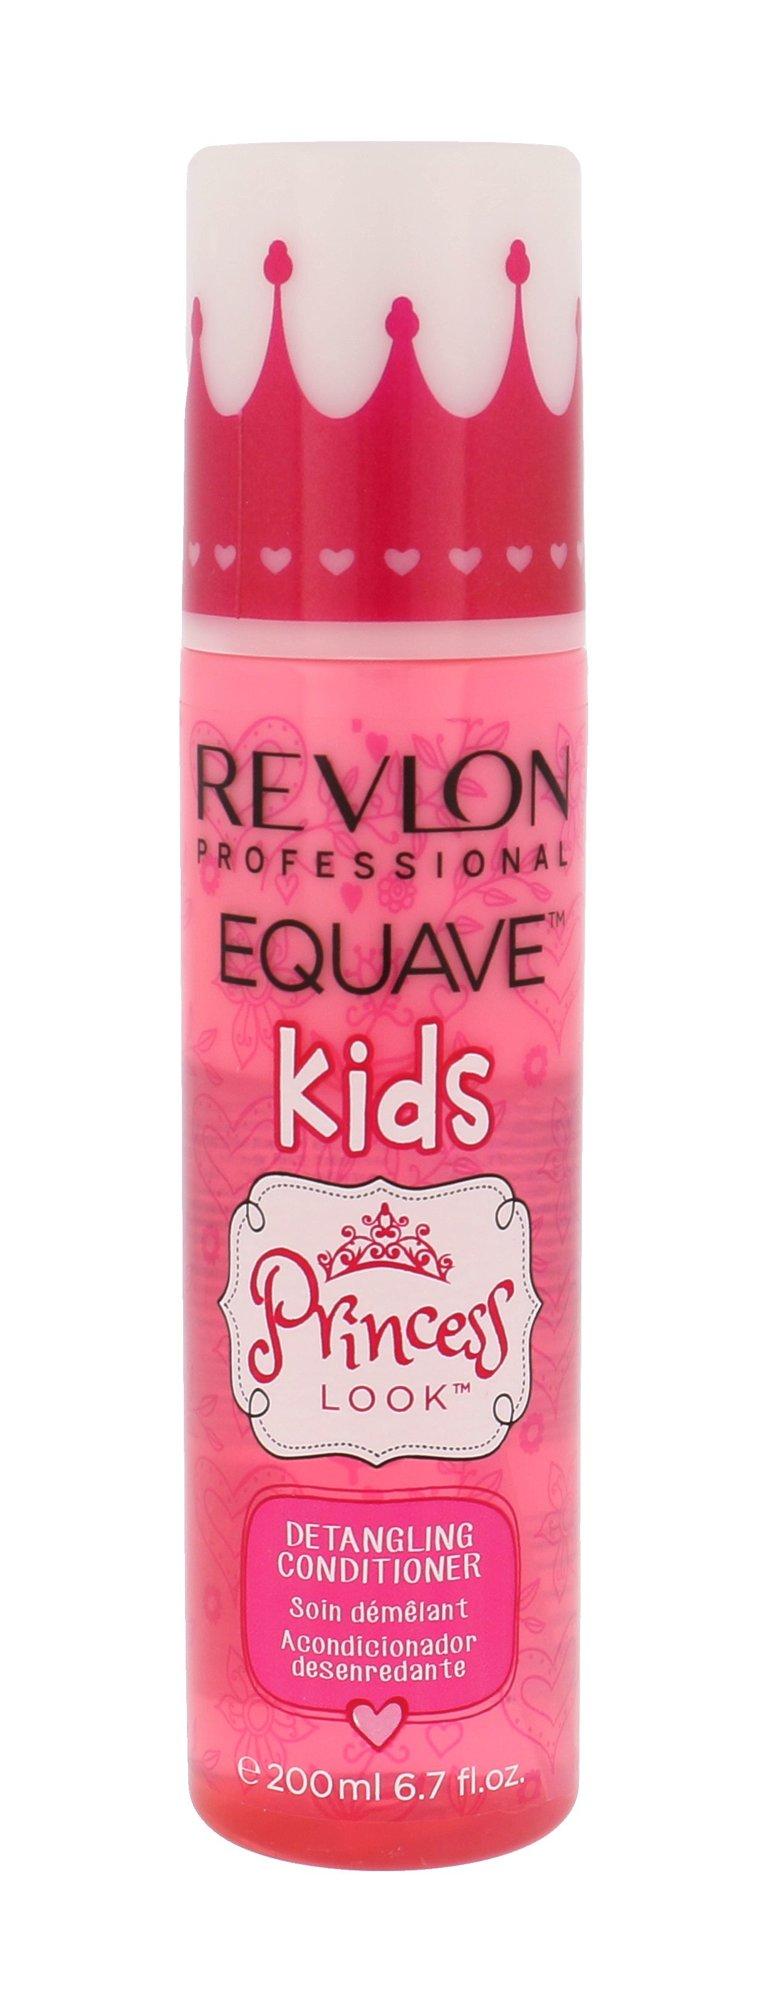 Revlon Professional Equave Kids Princess Look Detangling Conditioner